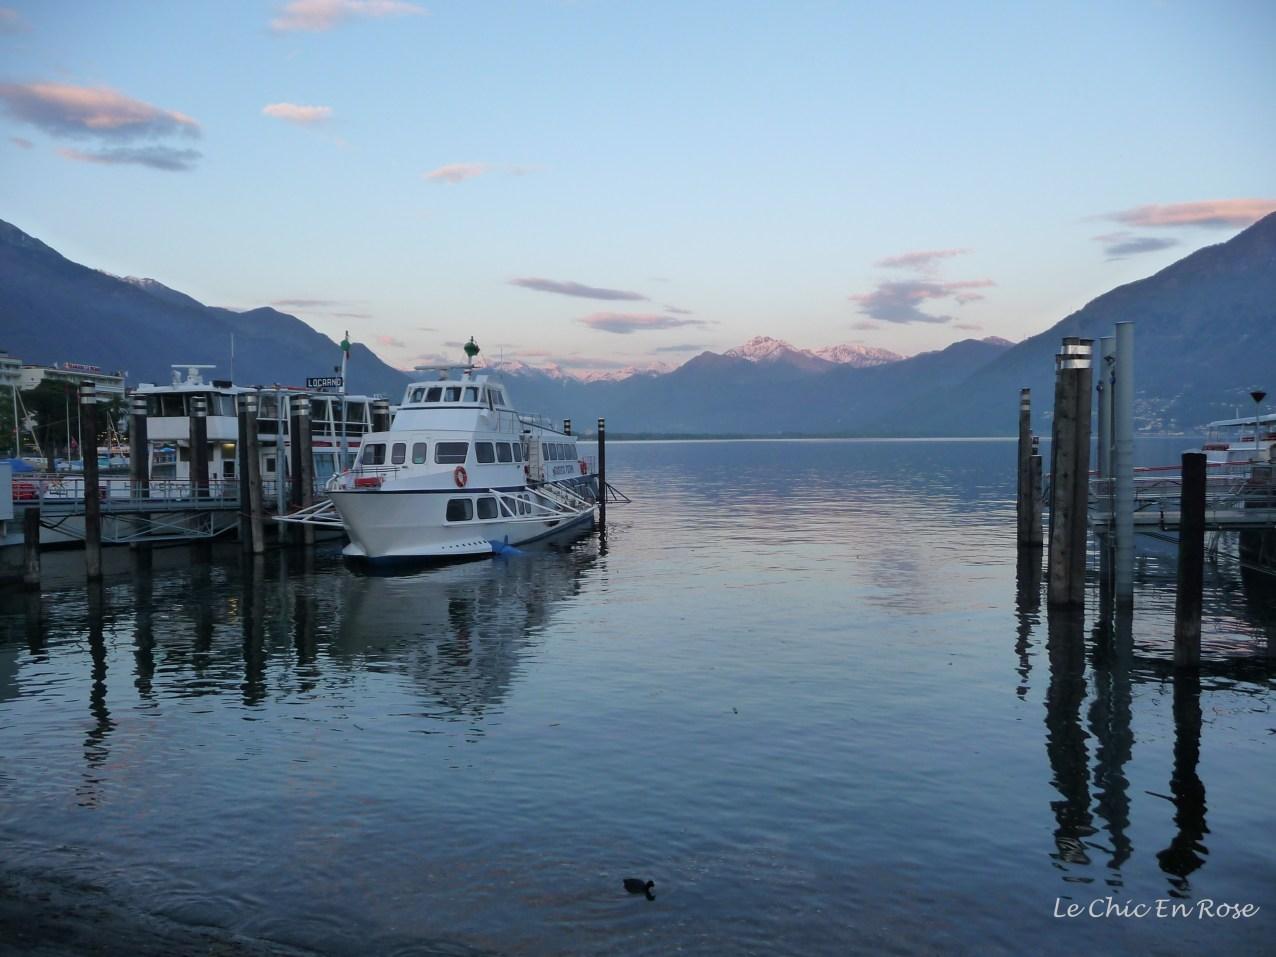 Lake Maggiore at dusk